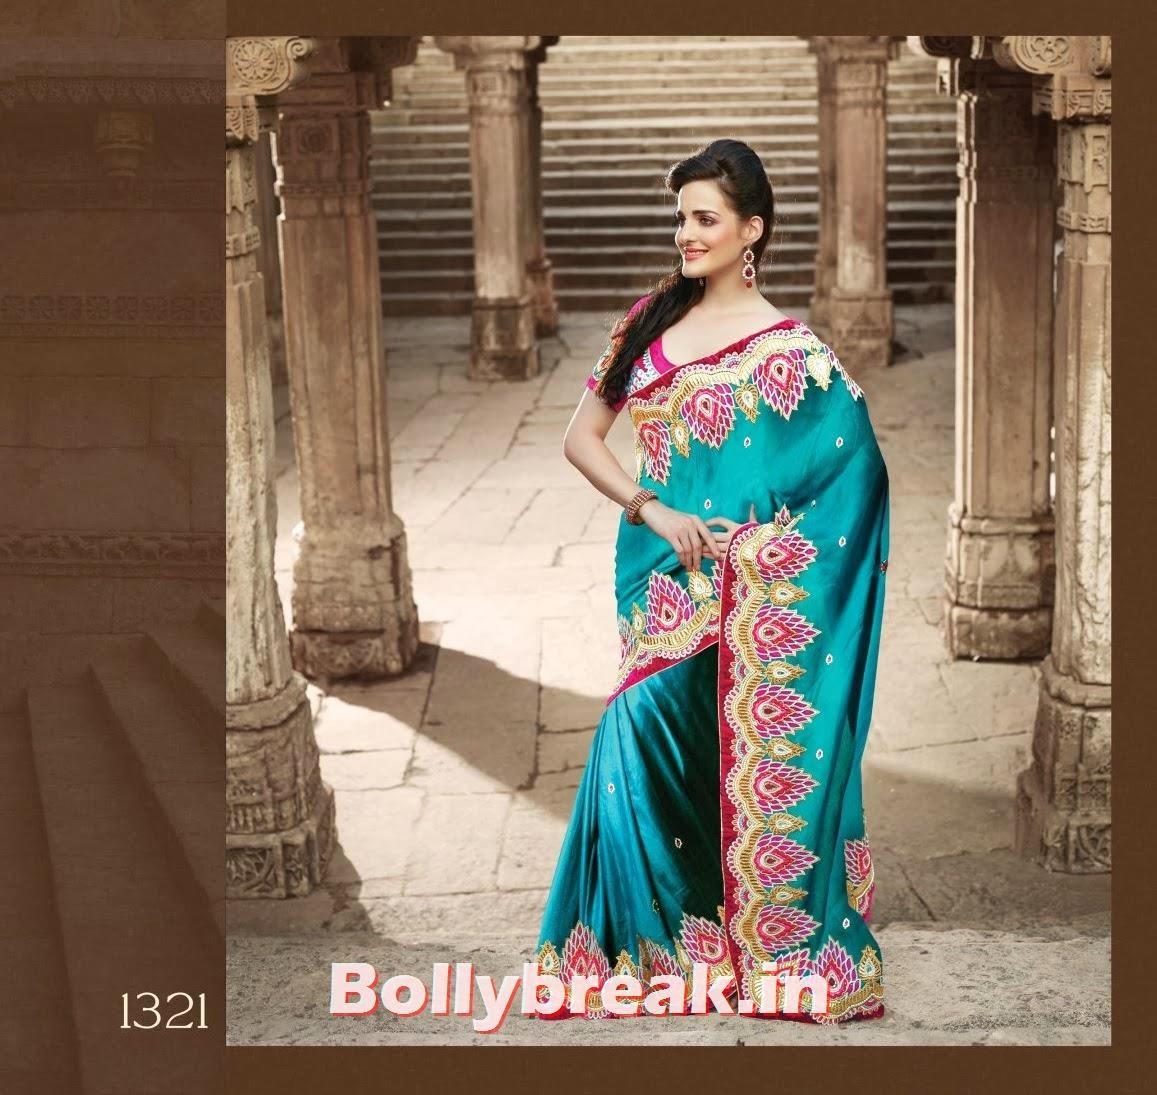 , Beautiful Indian Models in Saree